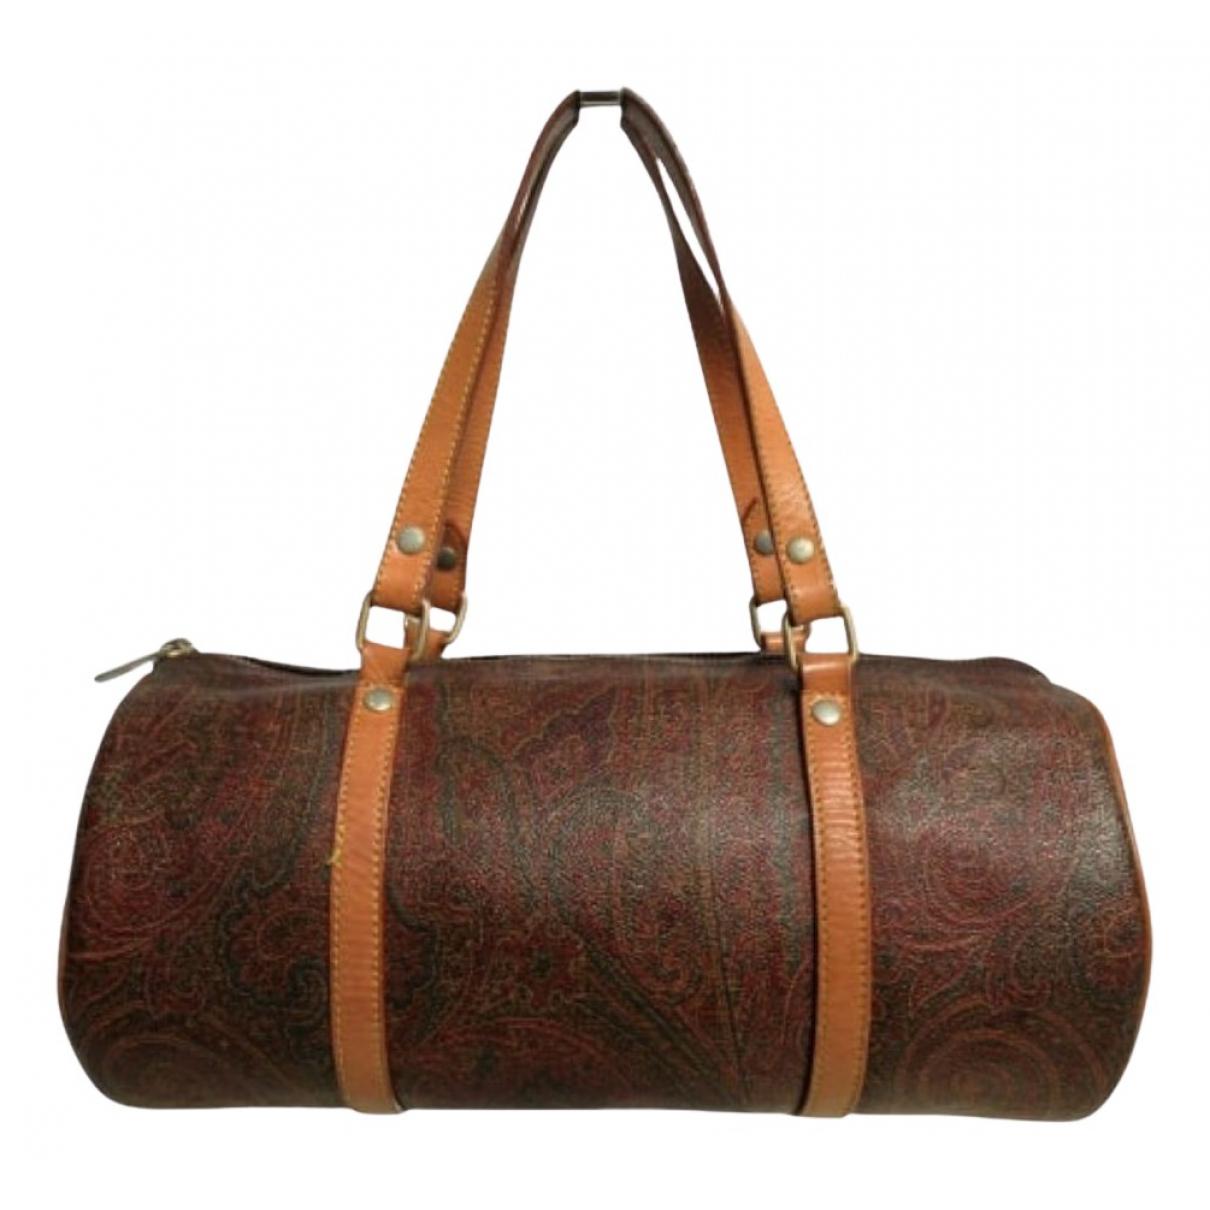 Etro N Brown Cloth handbag for Women N